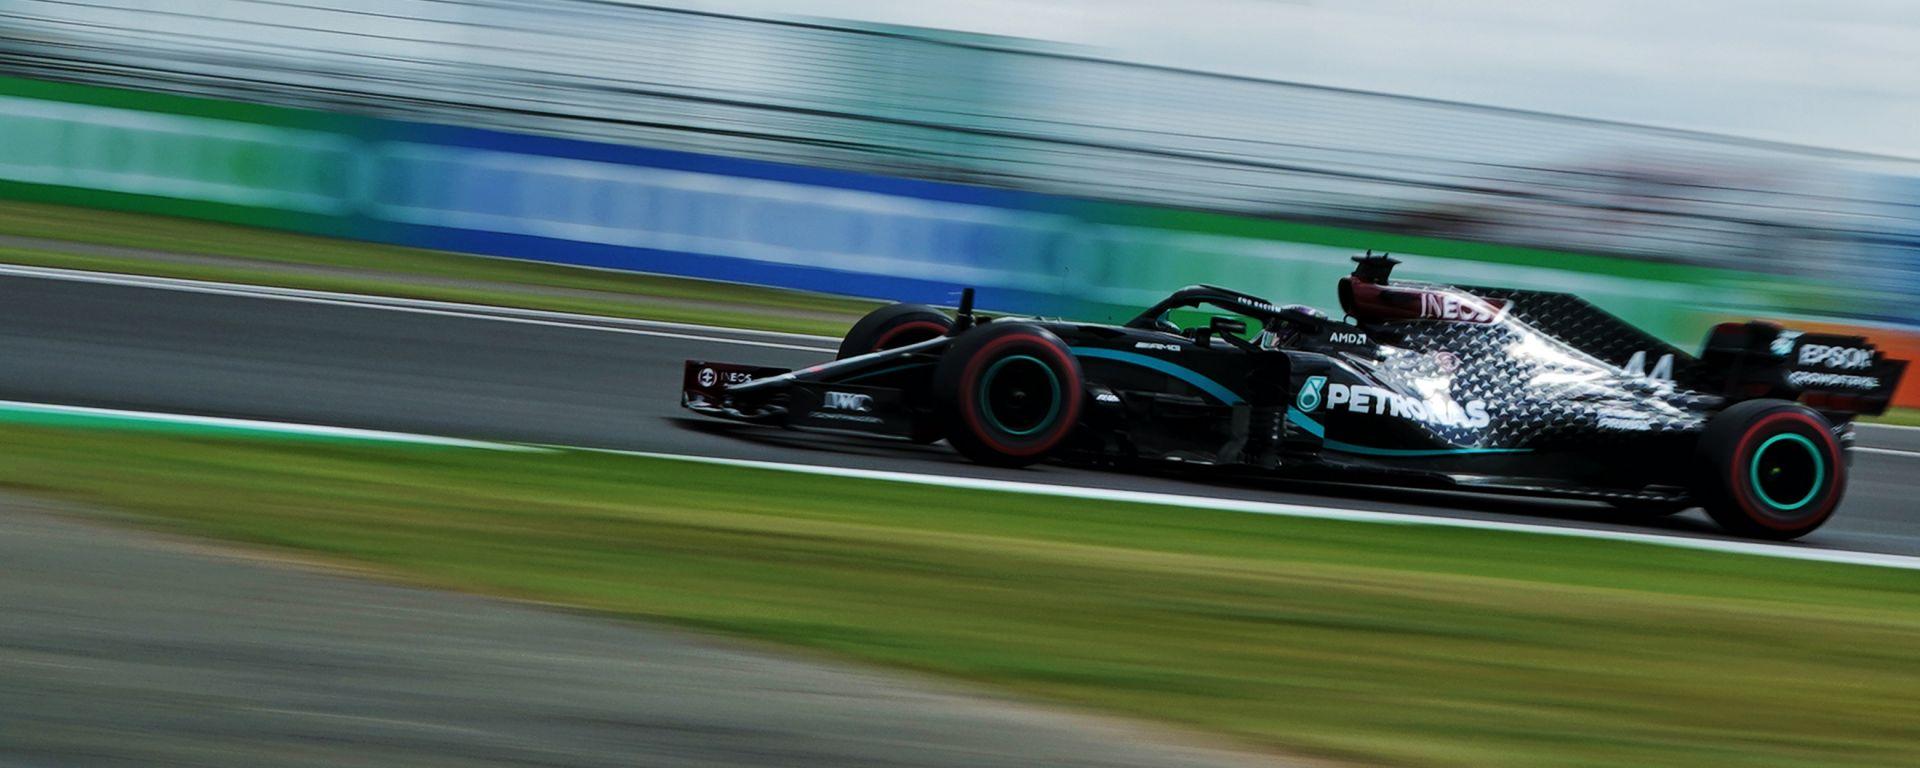 F1 GP Gran Bretagna 2020, Silverstone: Lewis Hamilton (Mercedes AMG F1) in qualifica